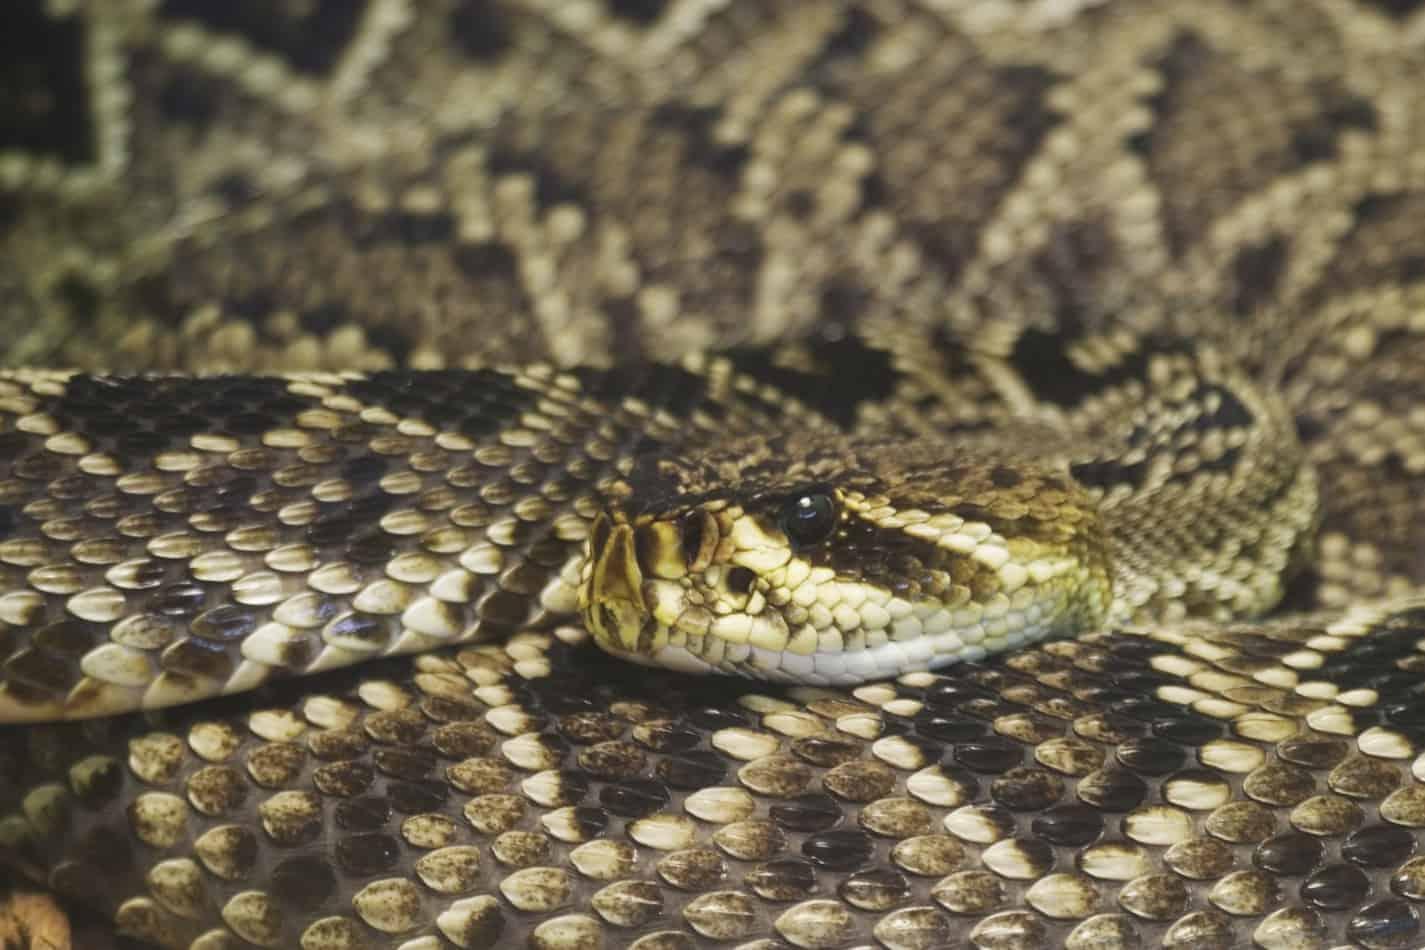 Species Profile: The Eastern Diamondback Rattlesnake